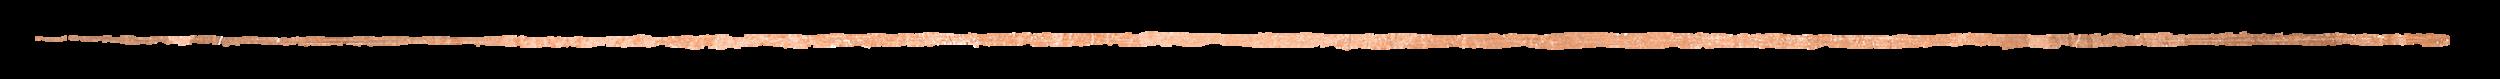 rosegolddividerline